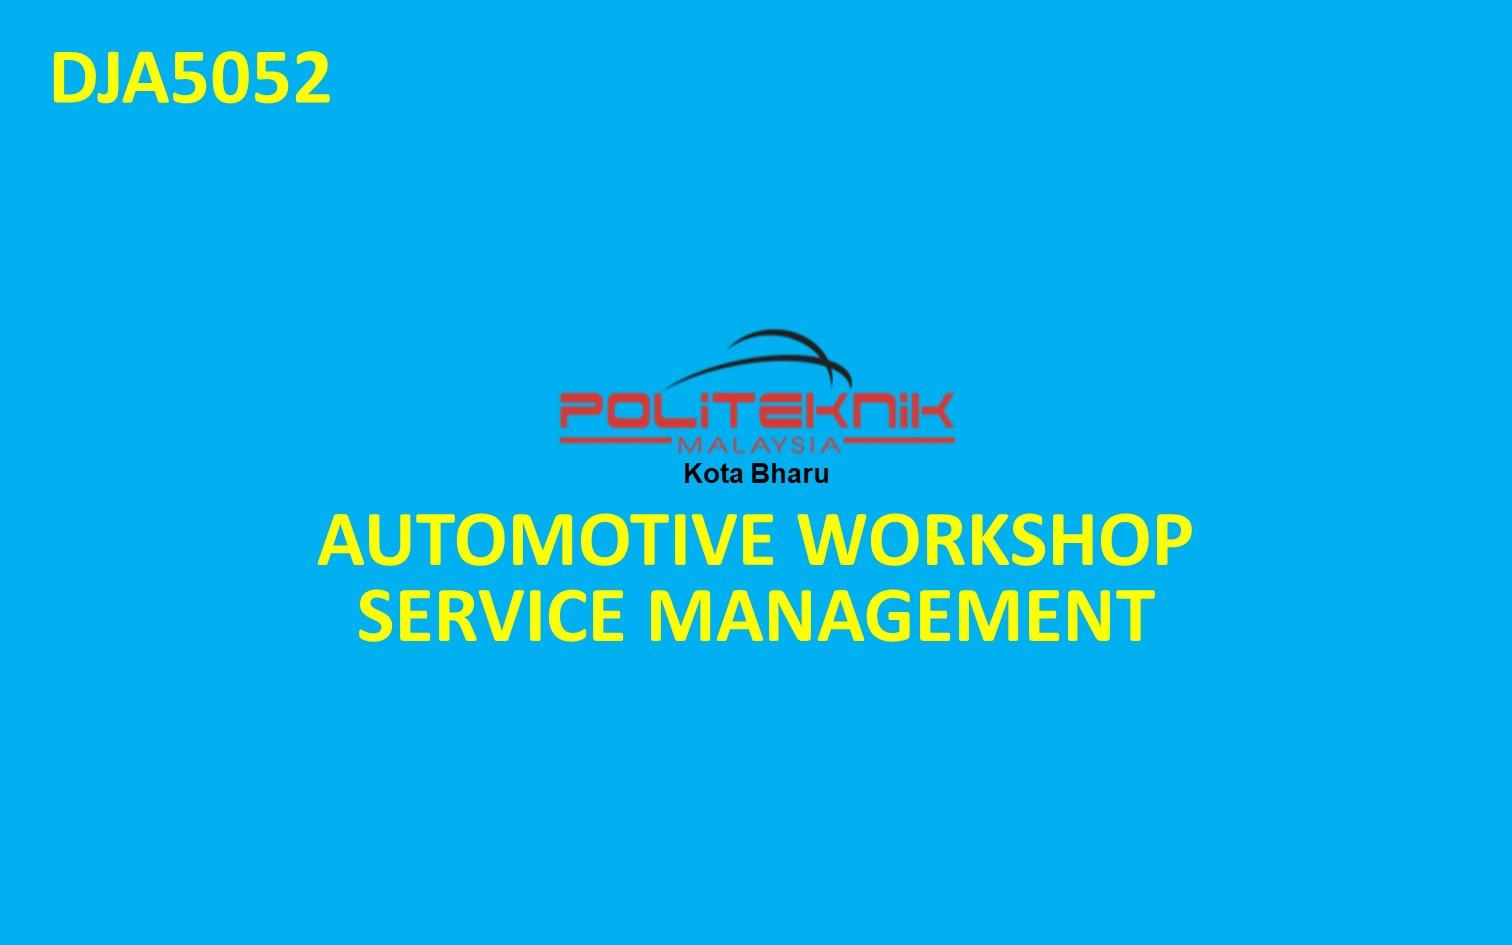 DJA5052 AUTOMOTIVE WORKSHOP SERVICE MANAGEMENT